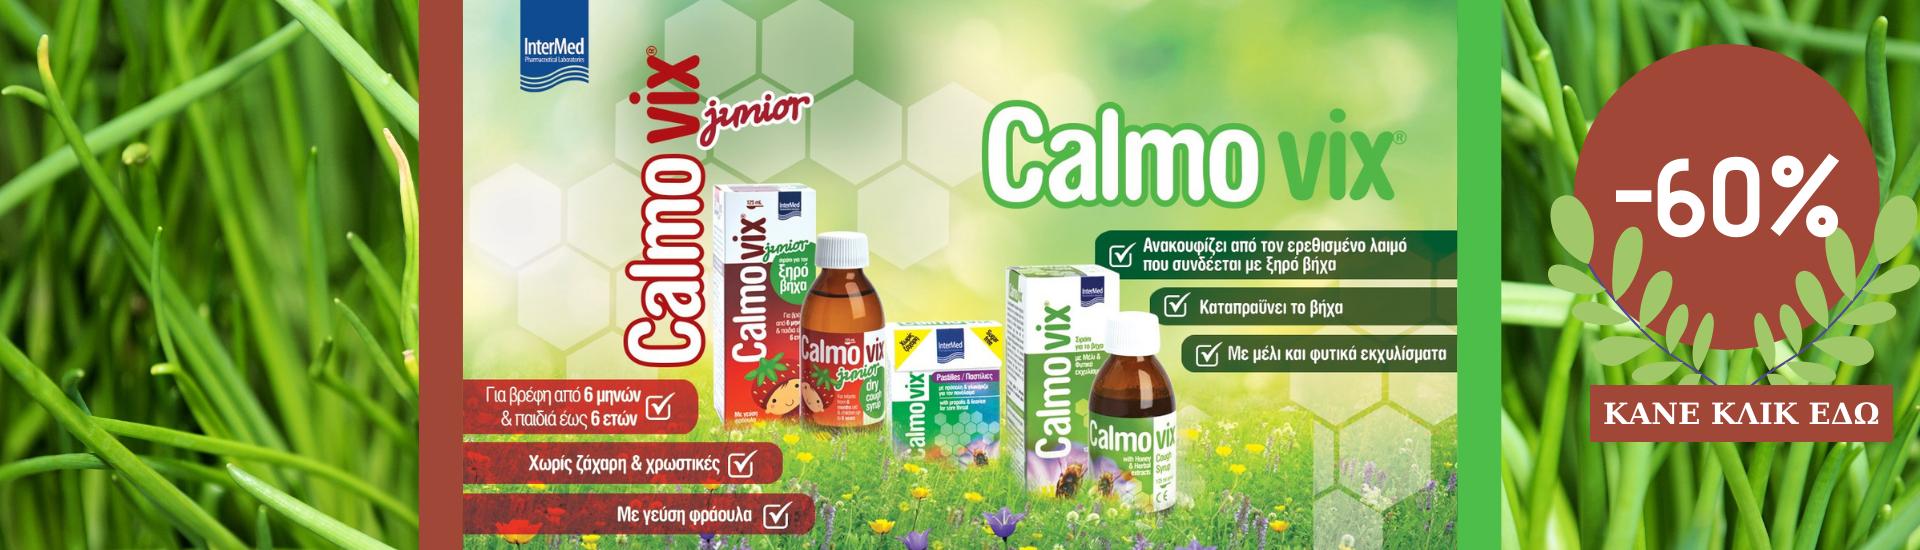 calmovix banner